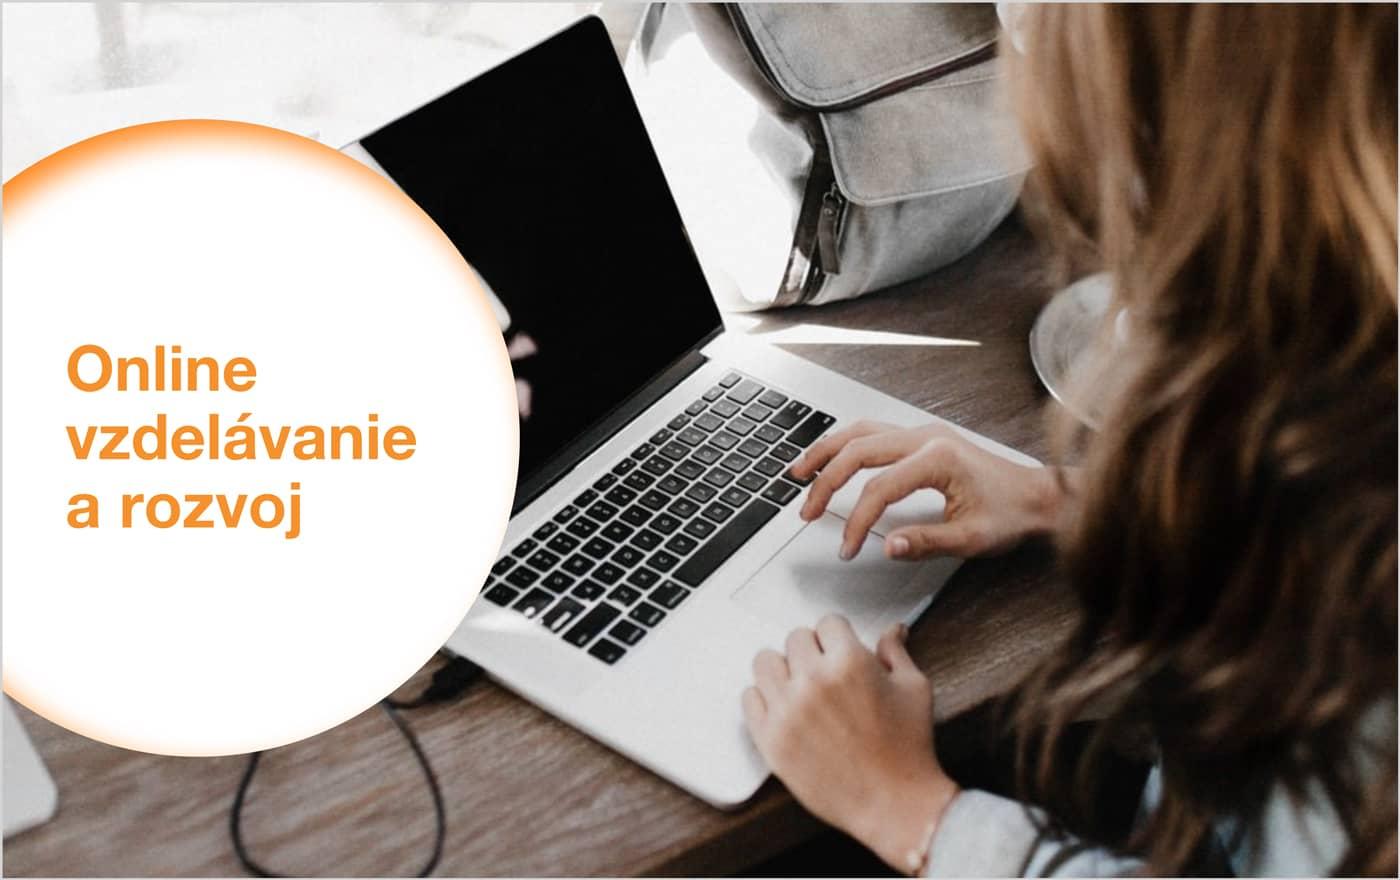 pe-banner-novinky-online-vzdelavanie-700x440@2x-c